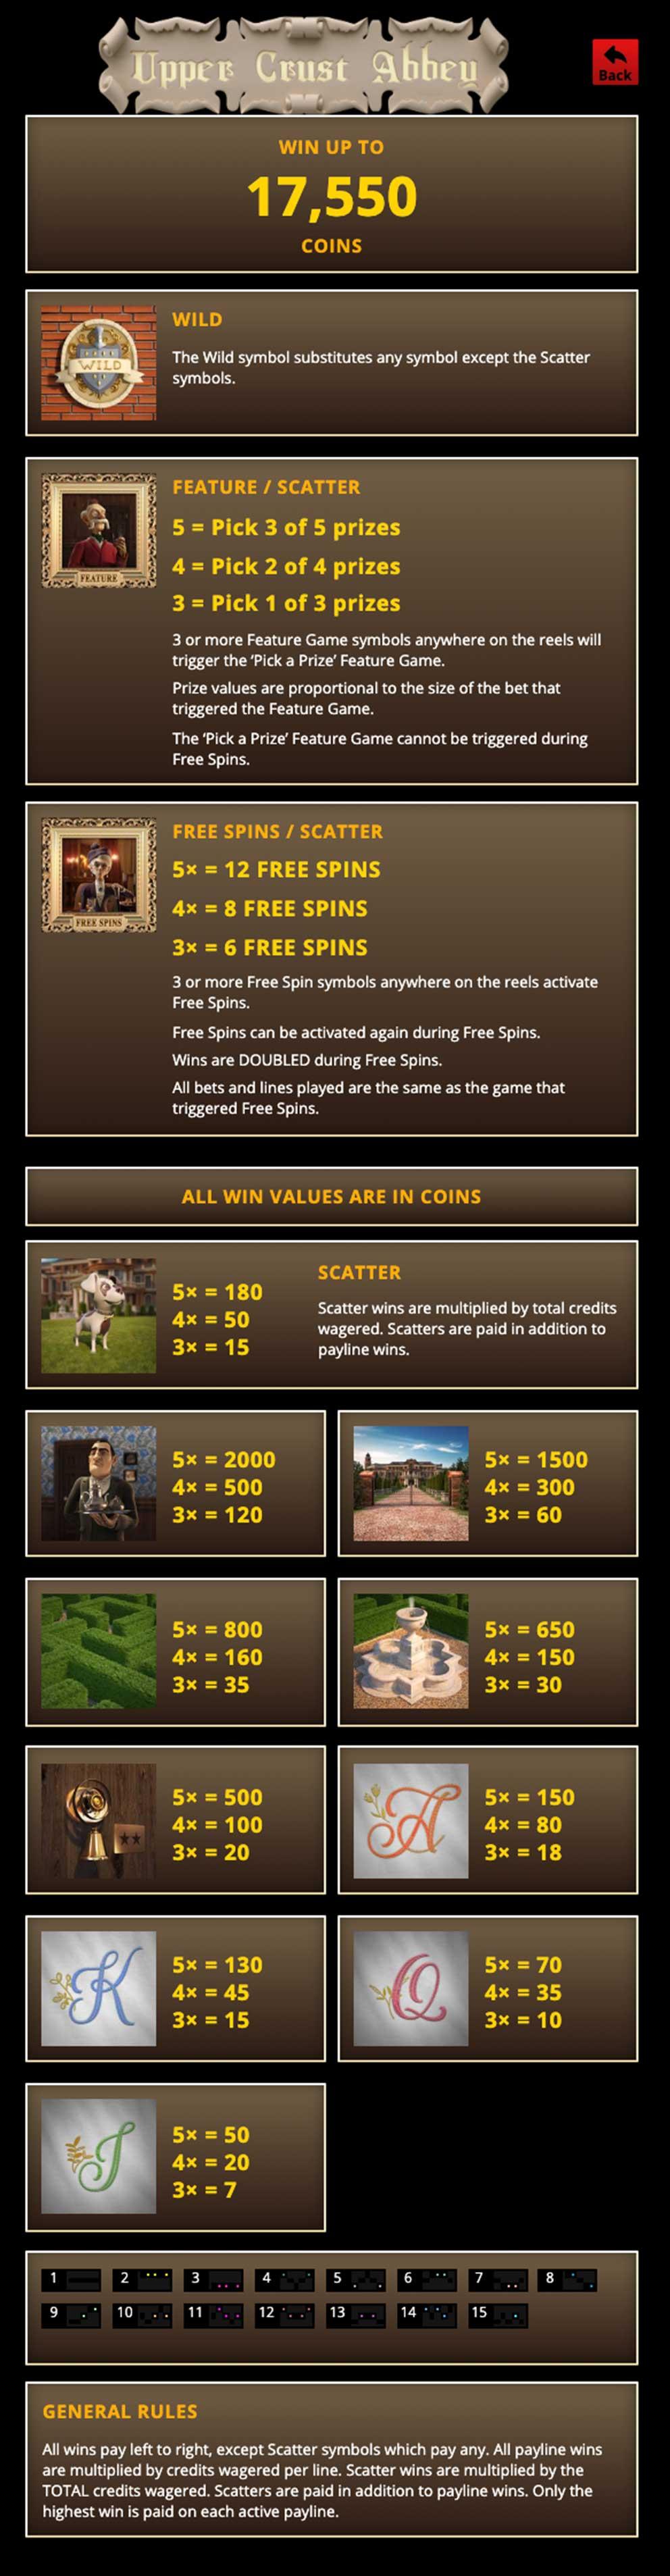 Upper Crust Abbey Pay Table Screenshot, Big Dollar Casino